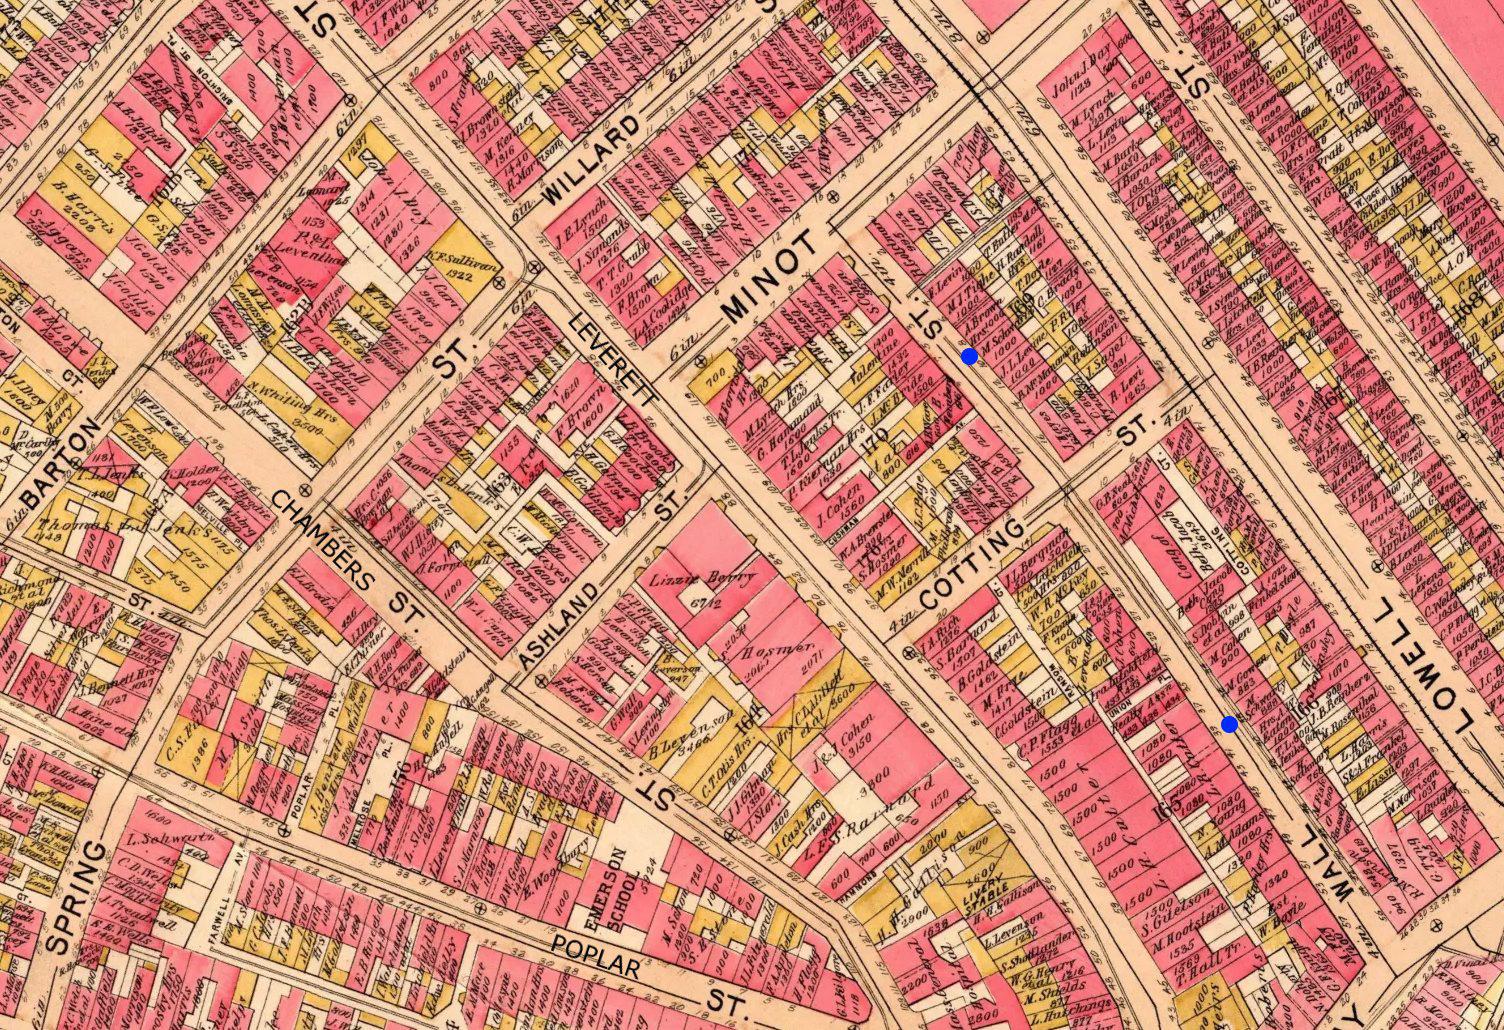 Schwartz Residences on 1895 Boston Bromley Atlas